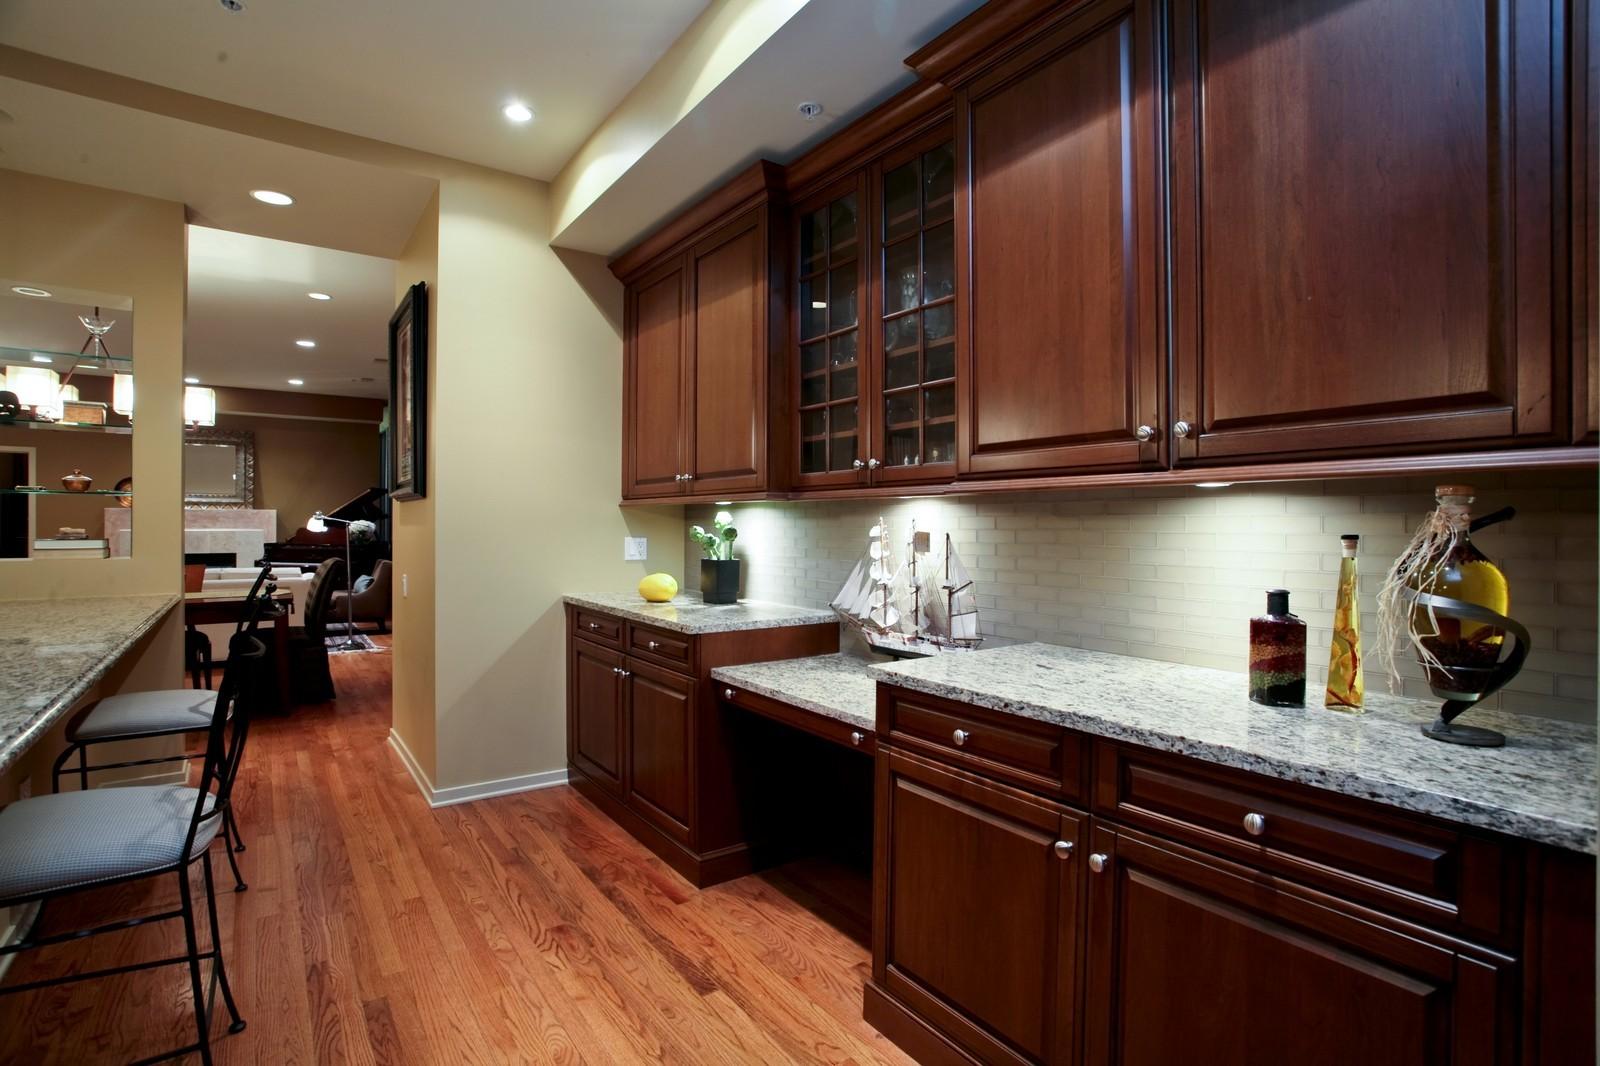 Real Estate Photography - 500 W Superior, Unit 703, Chicago, IL, 60654 - Kitchen